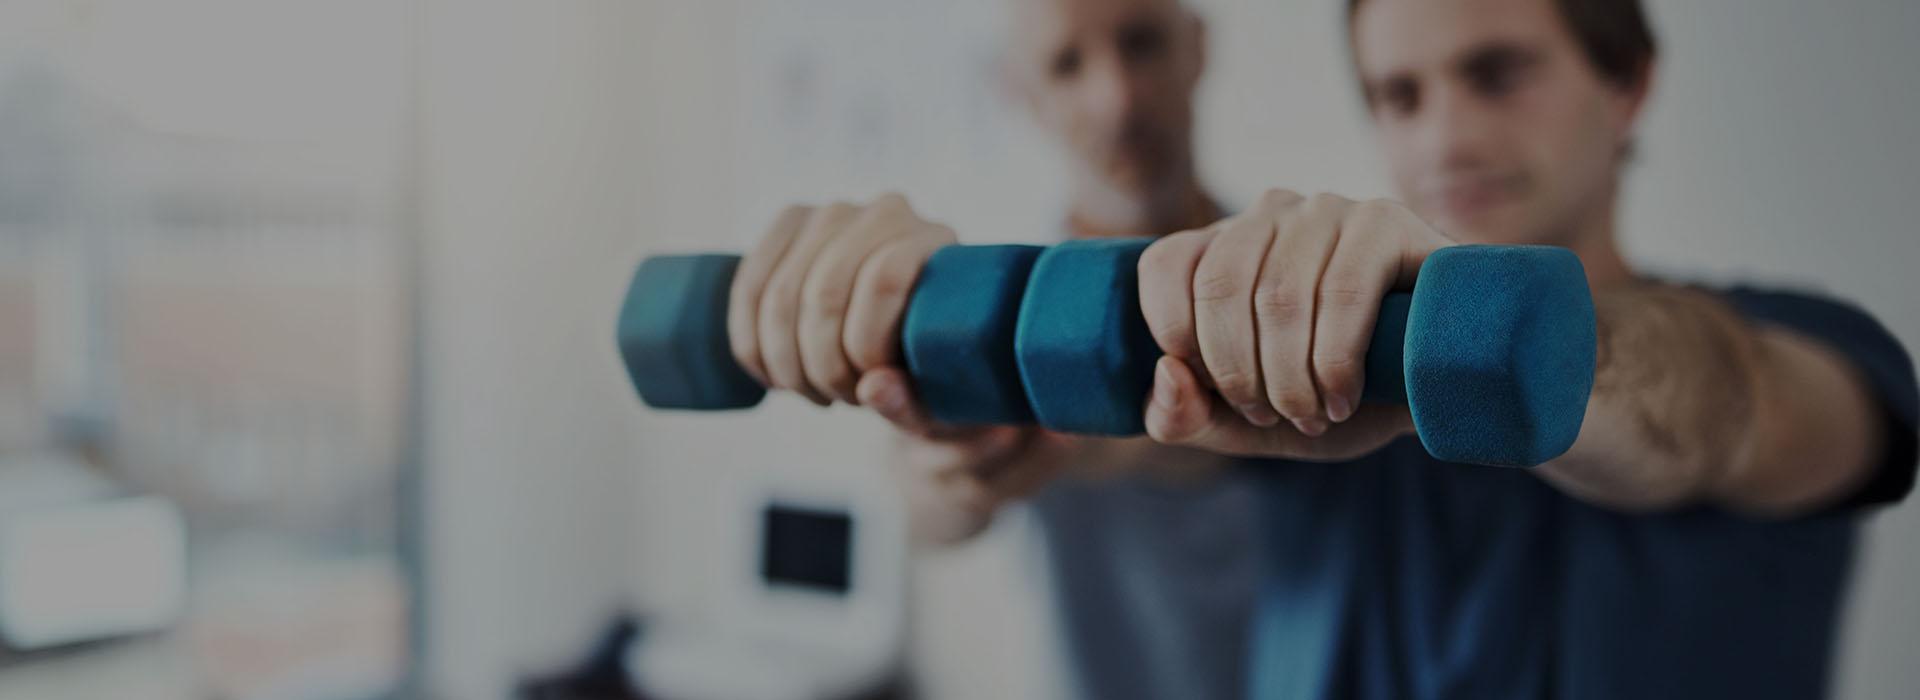 slider2-kint-fitness-tintigny